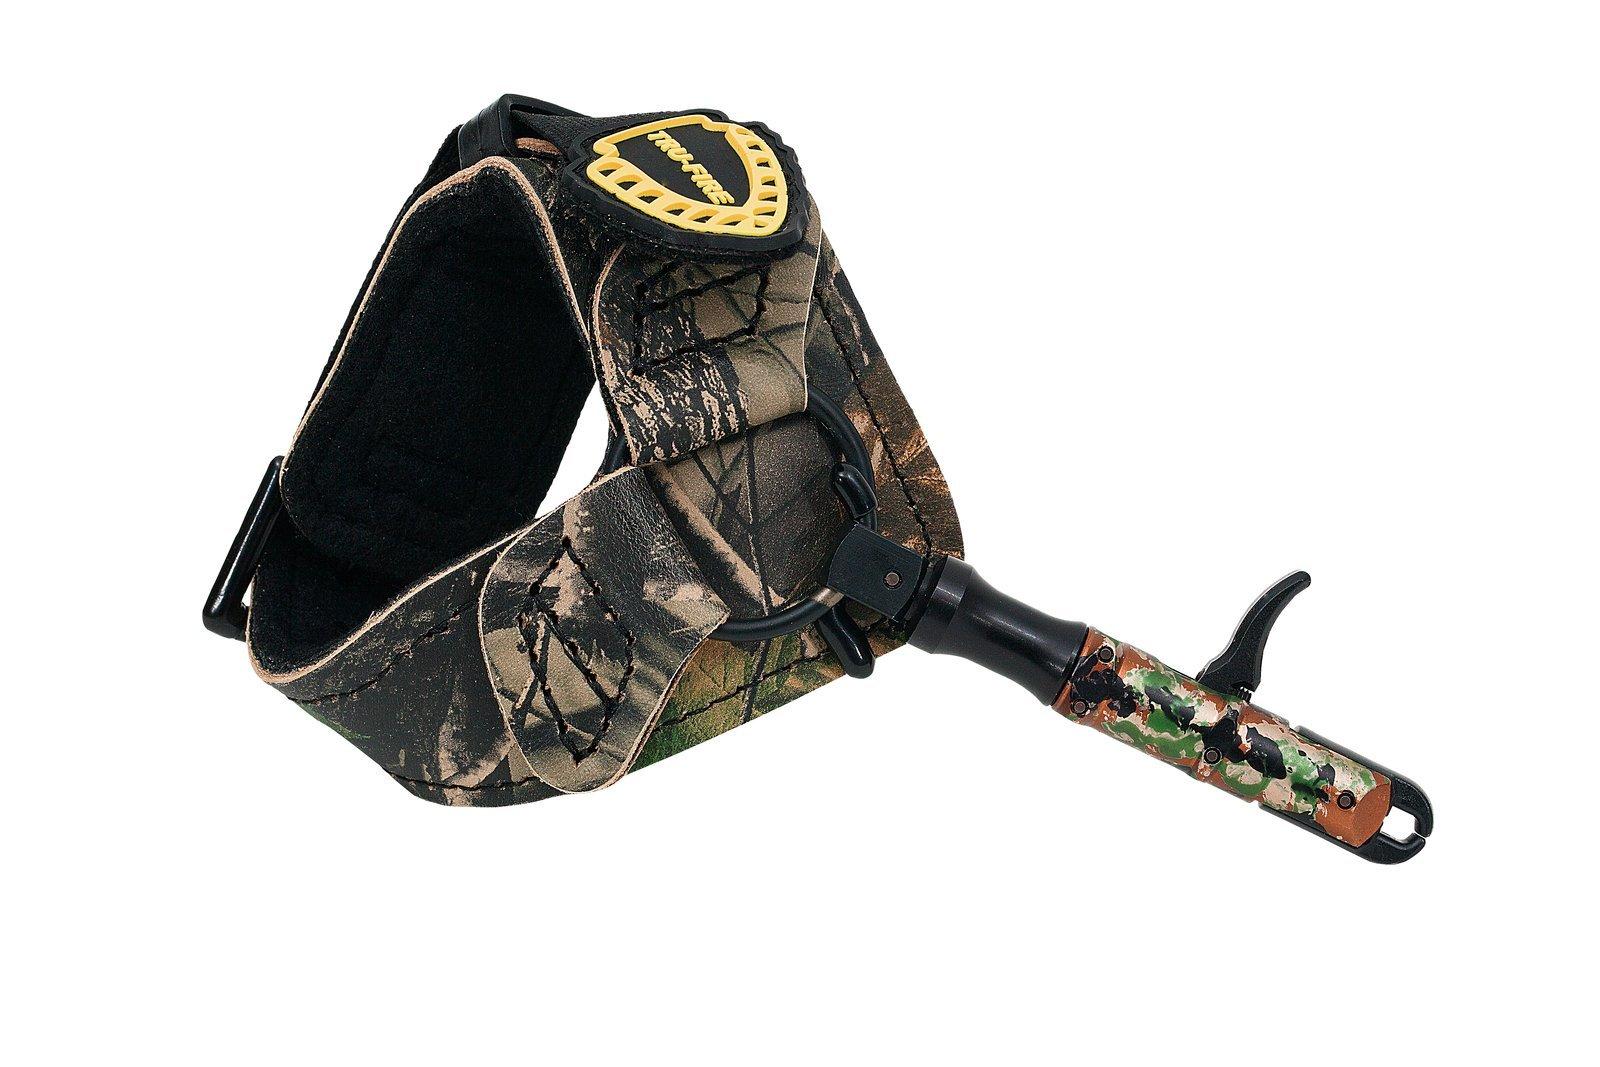 TruFire Edge Buckle Foldback Adjustable Archery Compound Bow Release - Camo Wrist Strap with Foldback Design by Tru-Fire